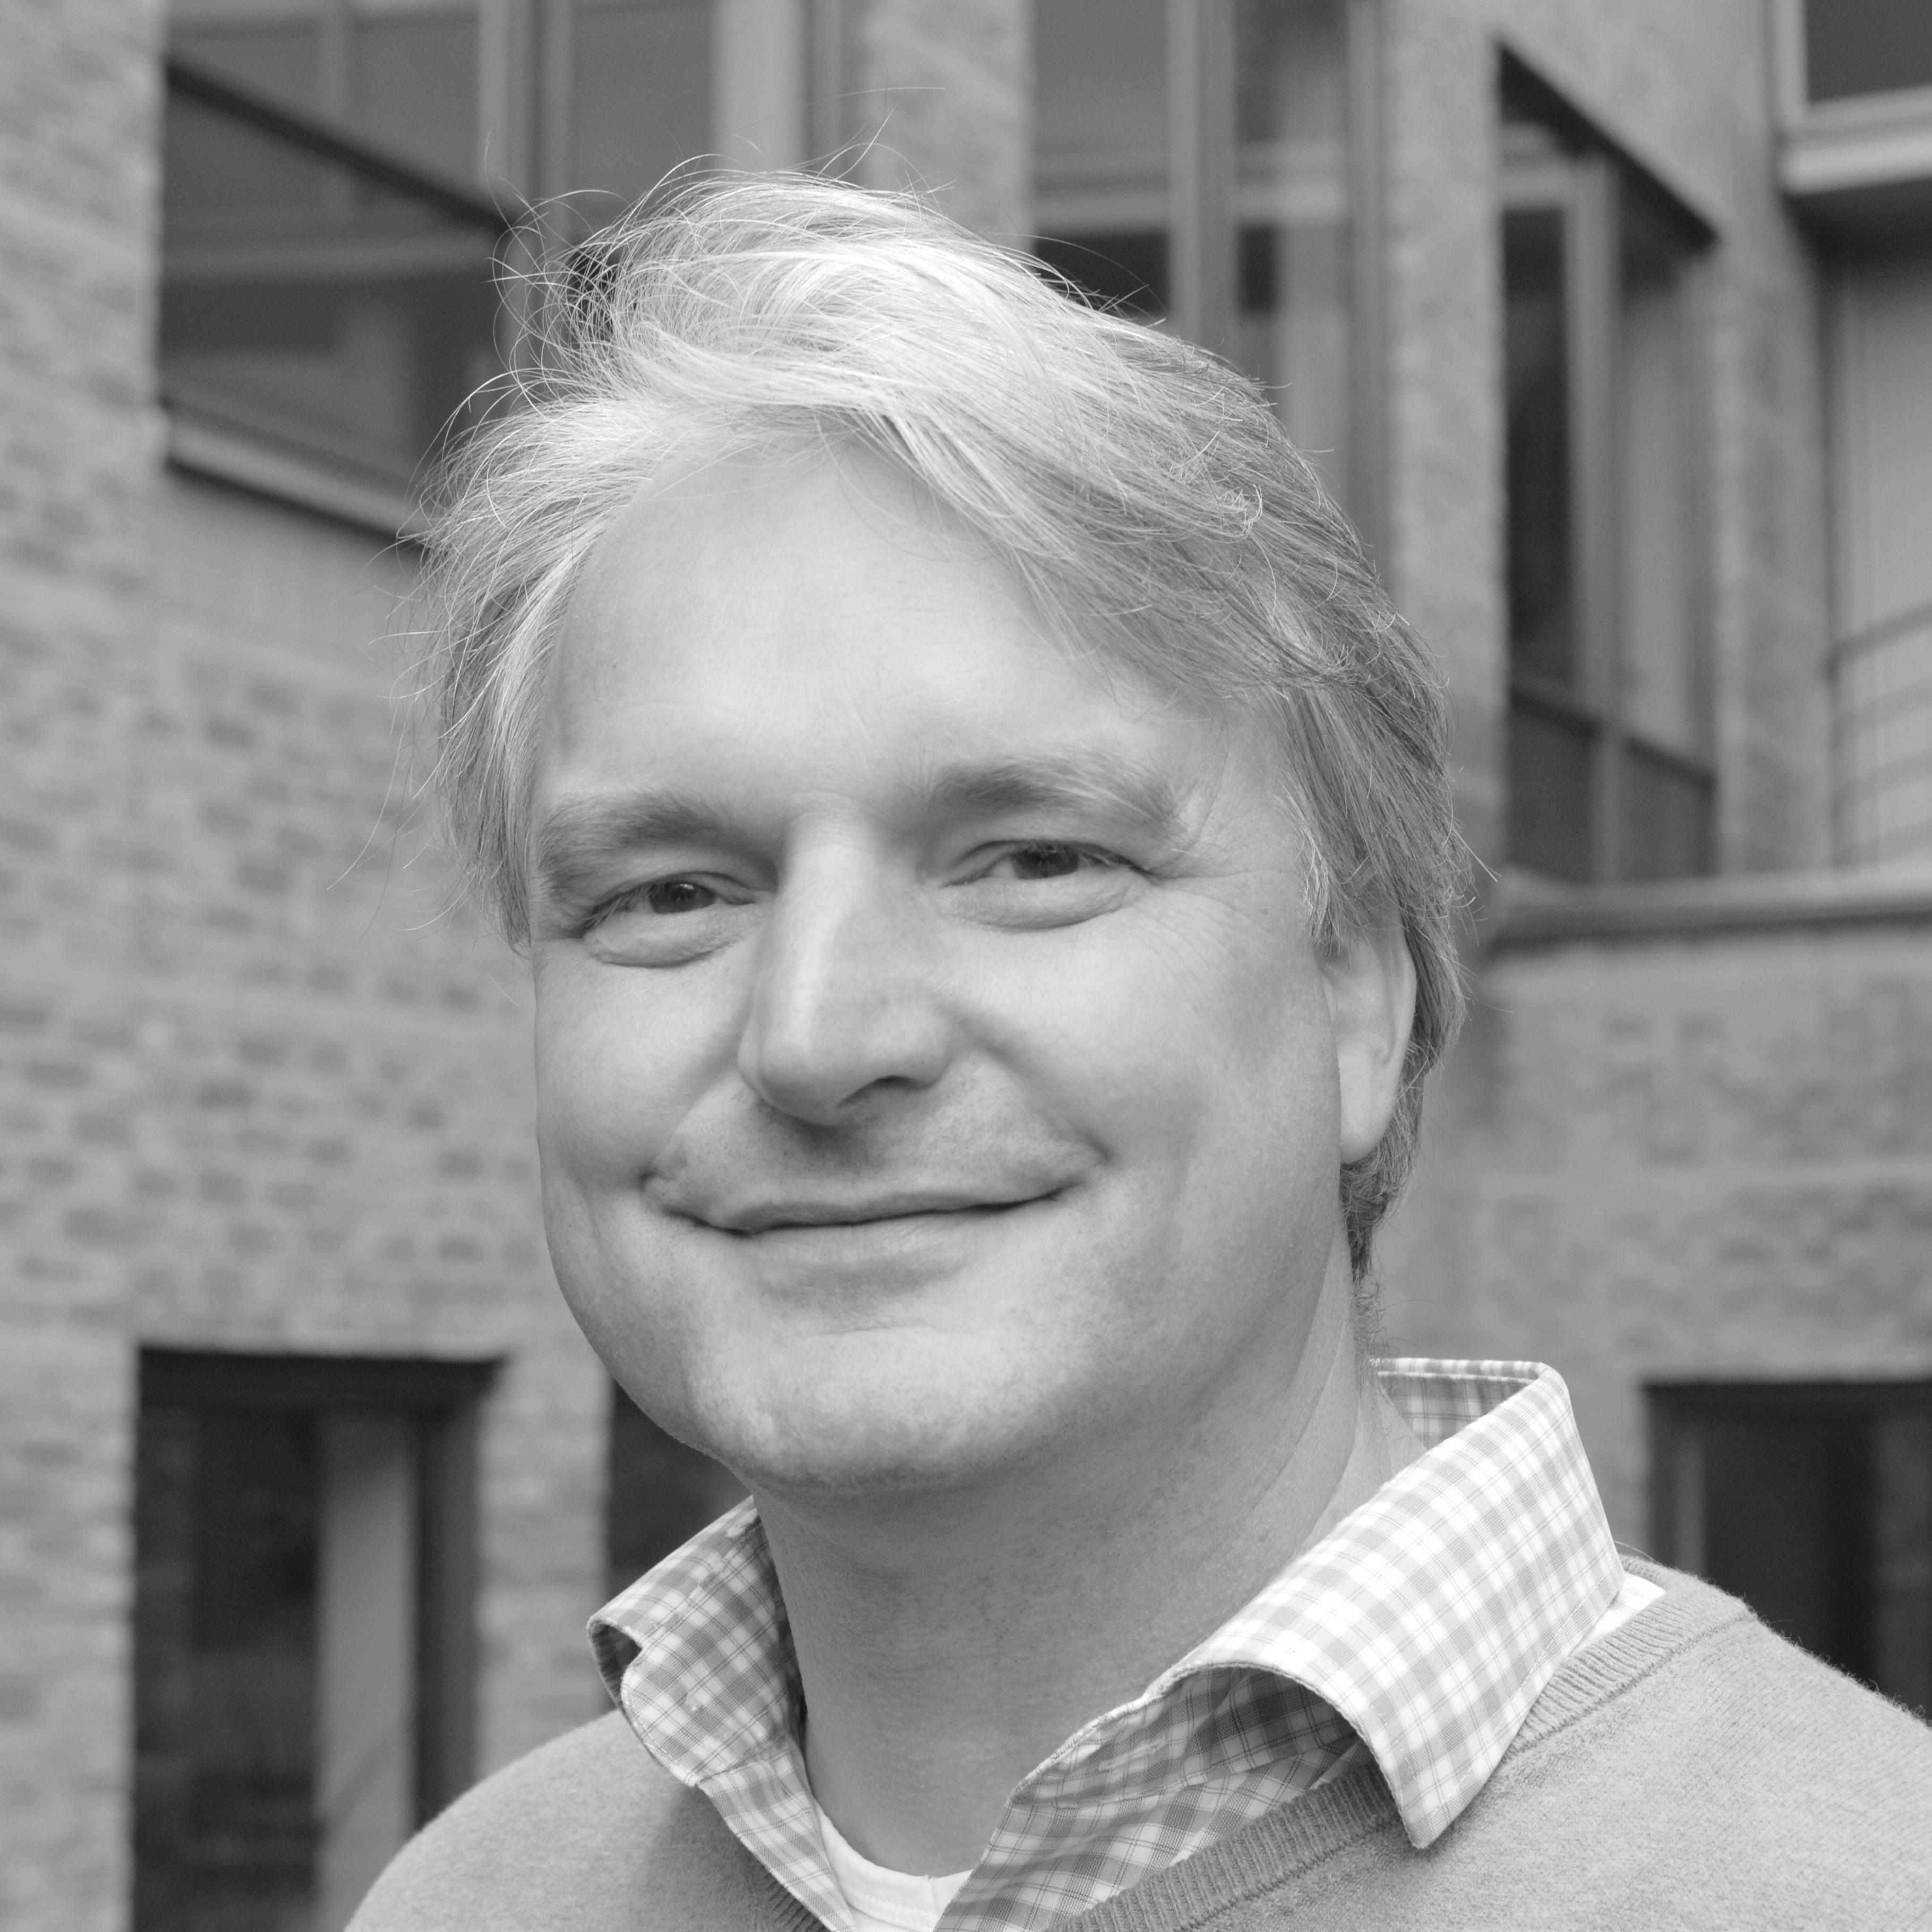 Chris Veenstra